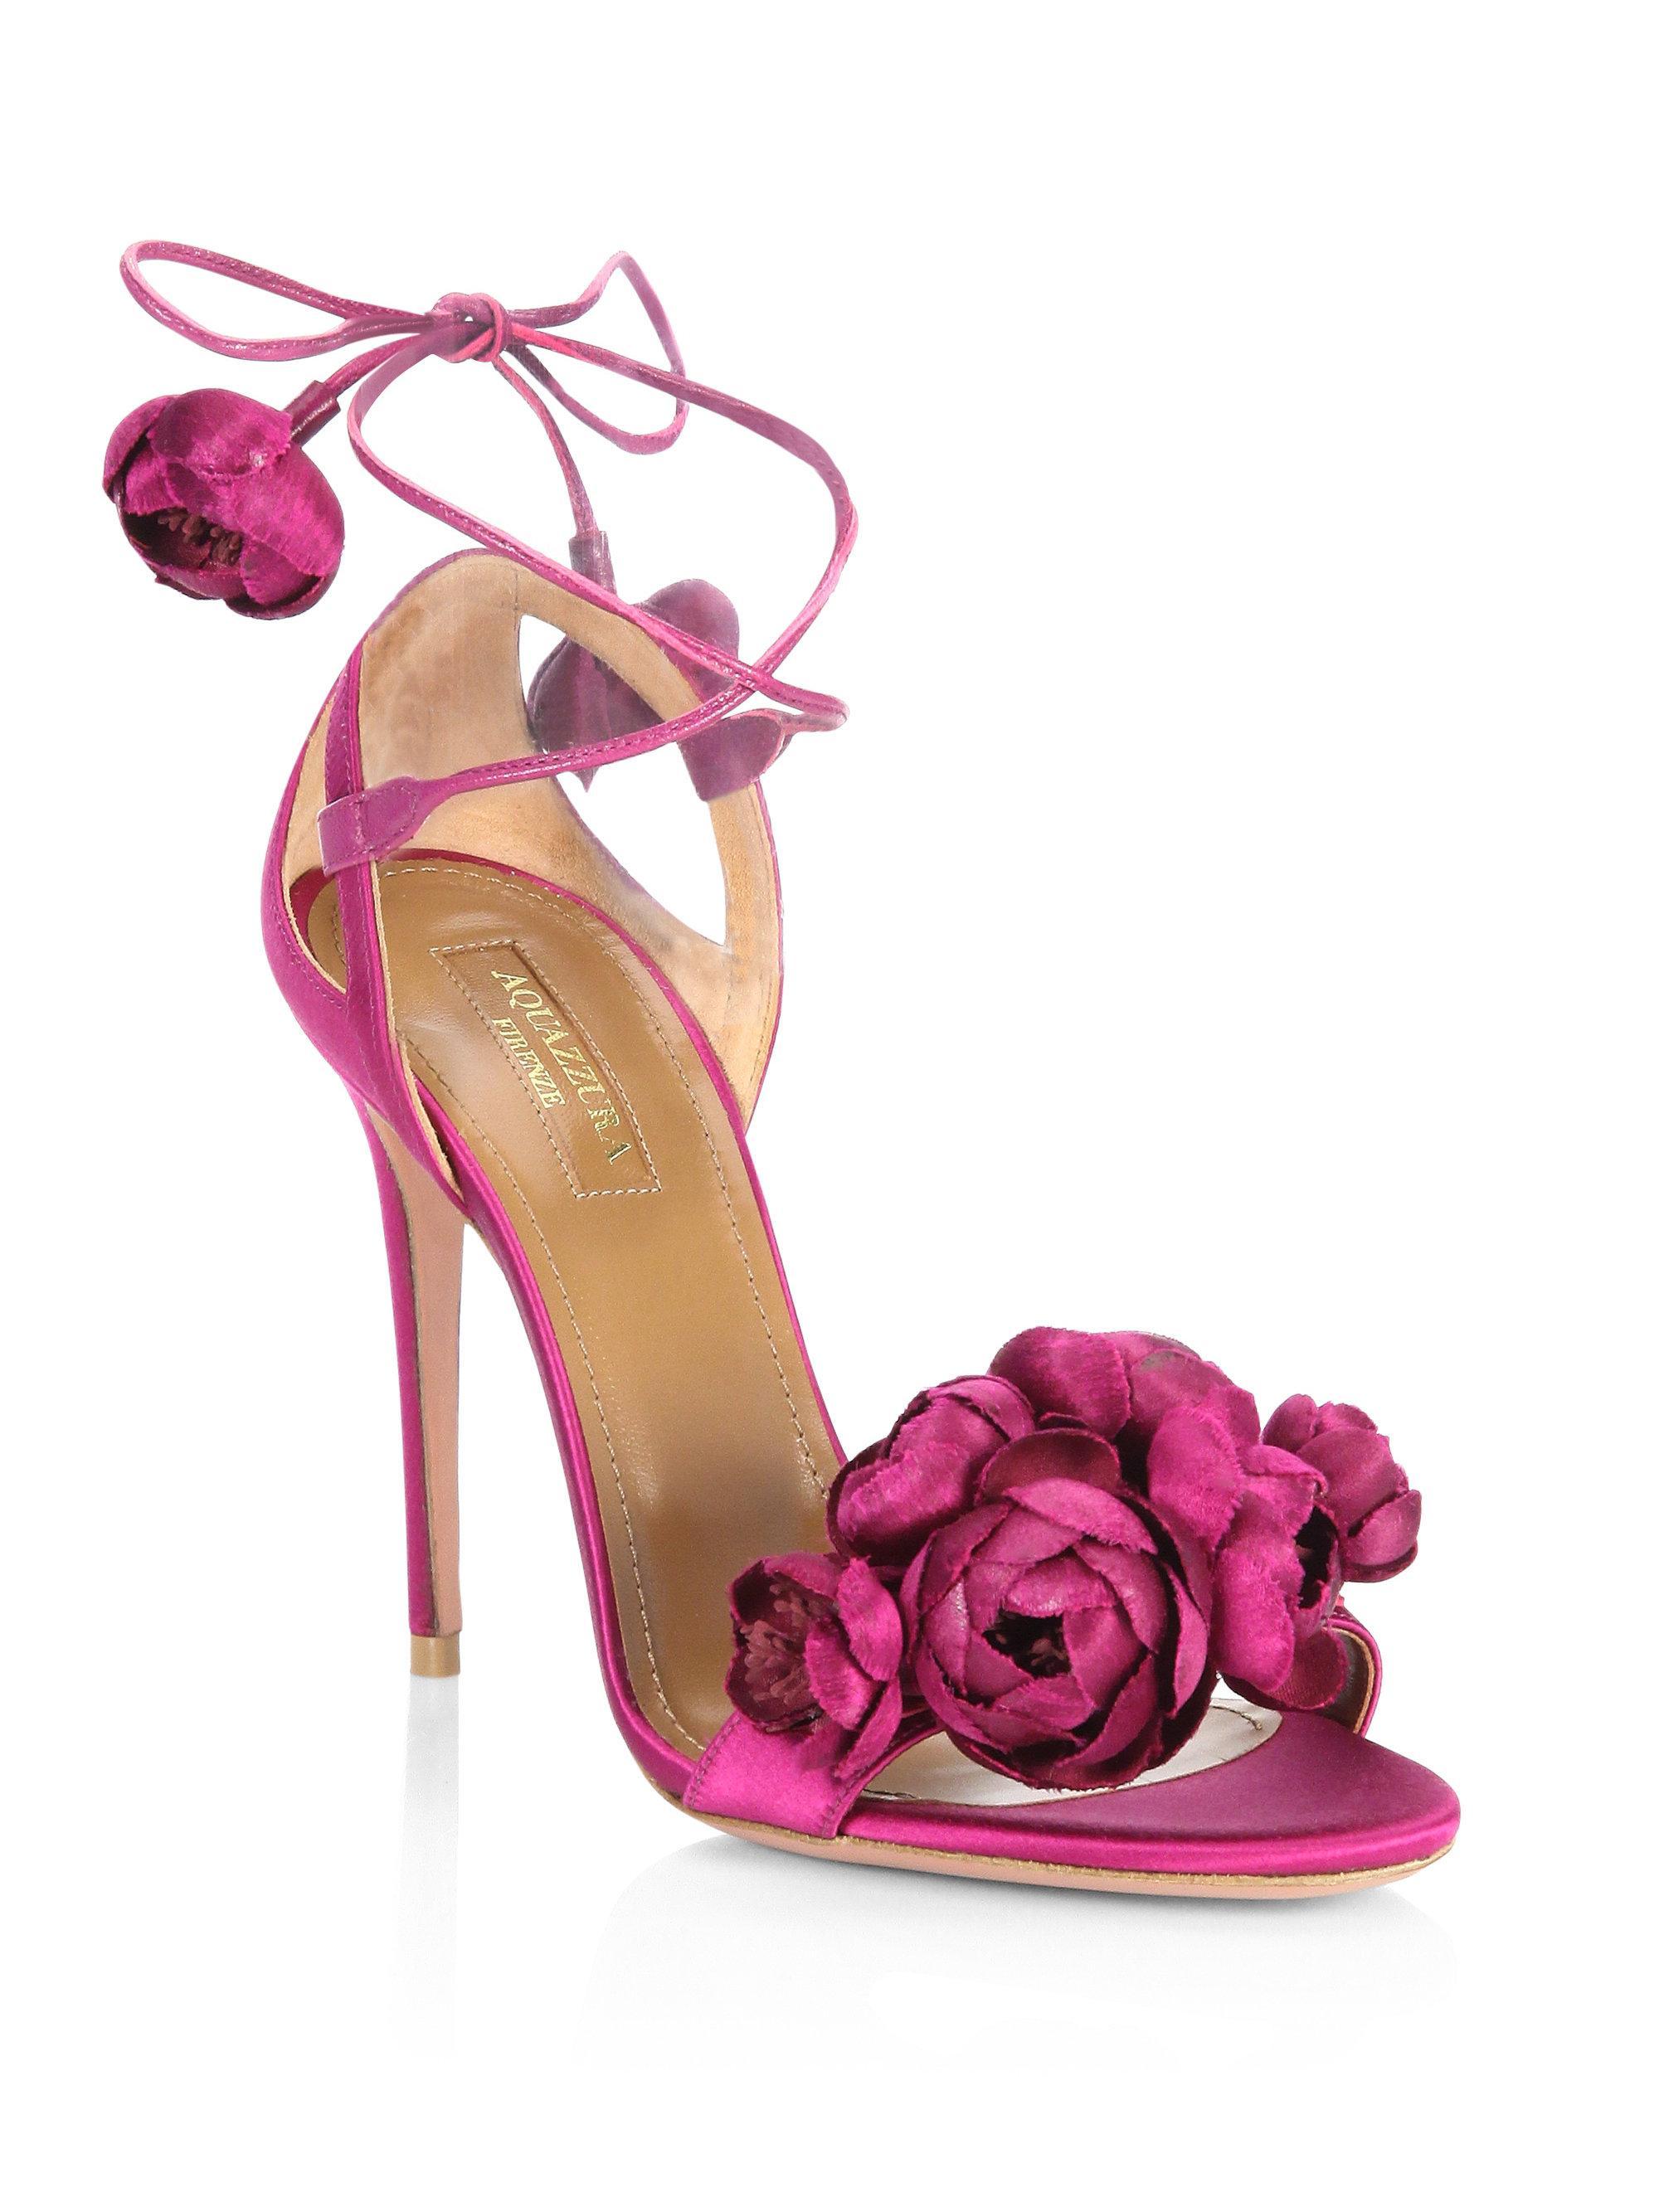 Lyst Aquazzura Wild Flower Satin Ankle Wrap Sandals In Pink